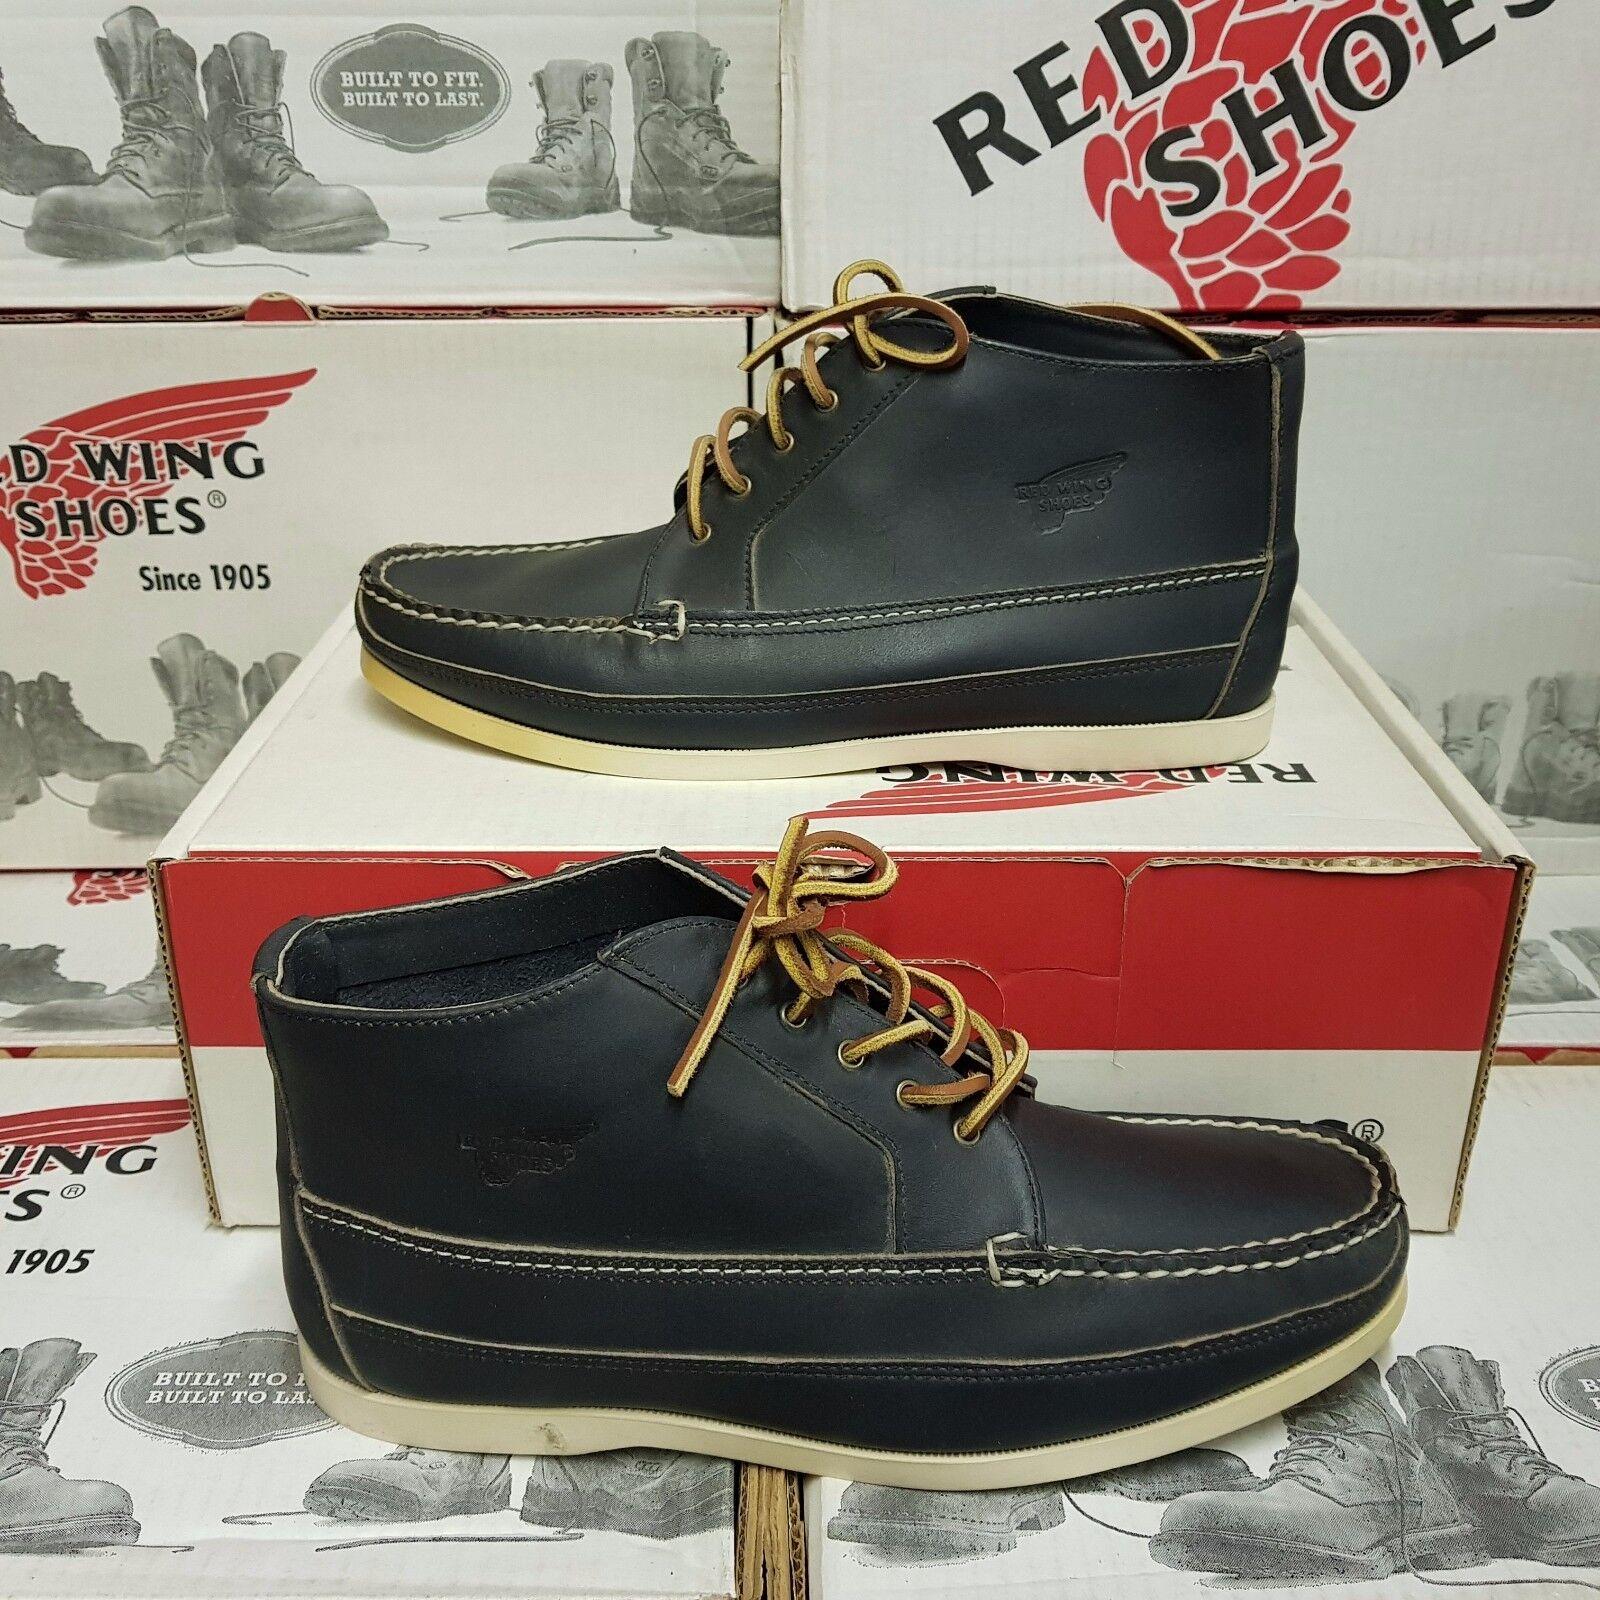 rot WING schuhe 9140 Chukka Chukka Chukka herren leather Stiefel UK 11 US 12 EUR 45,5 (pv 349 ) 1043b1